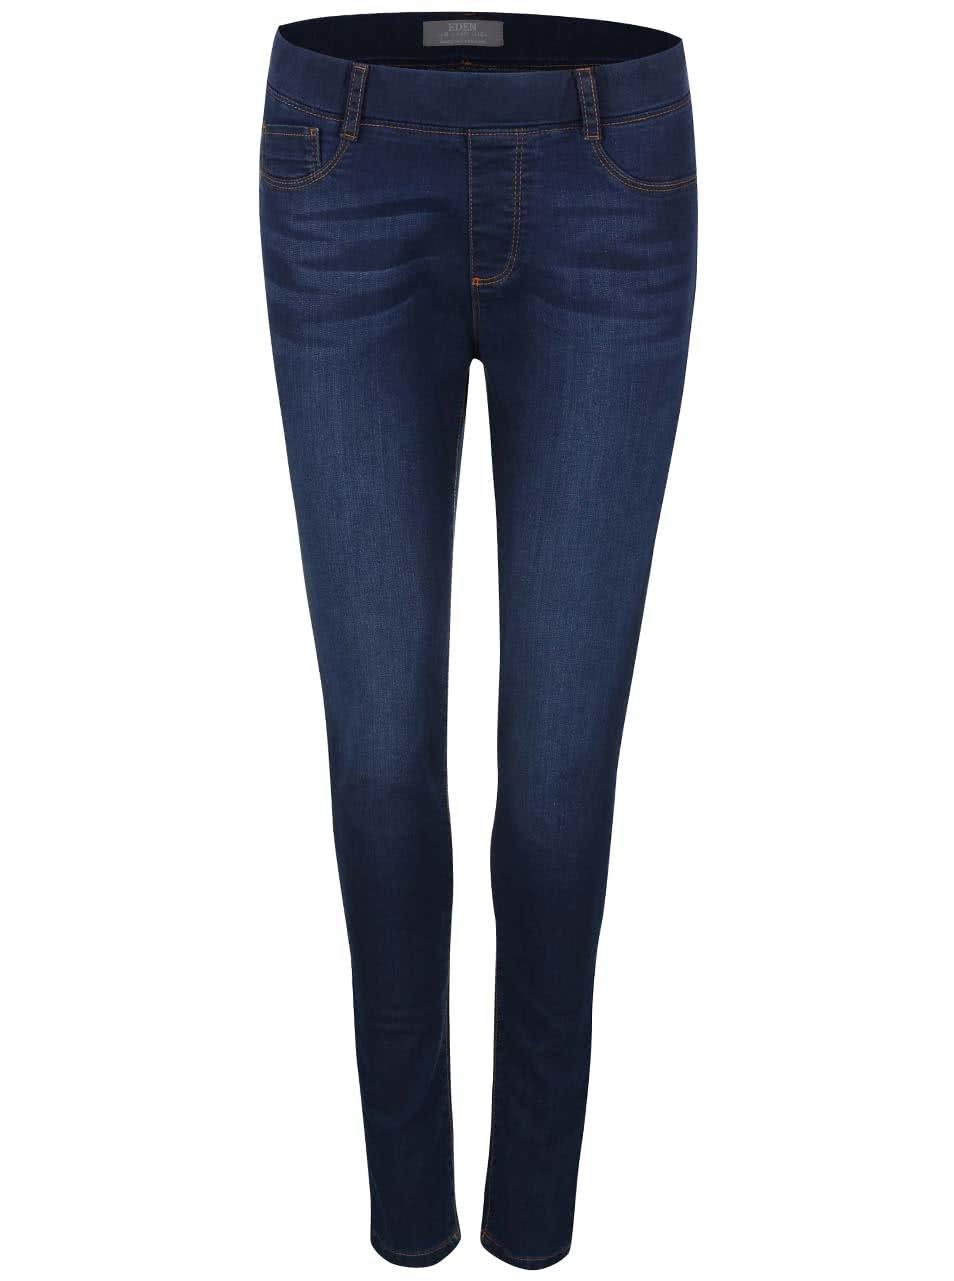 Modré skinny džíny Dorothy Perkins ŽENY   Kalhoty 9c564f2b12